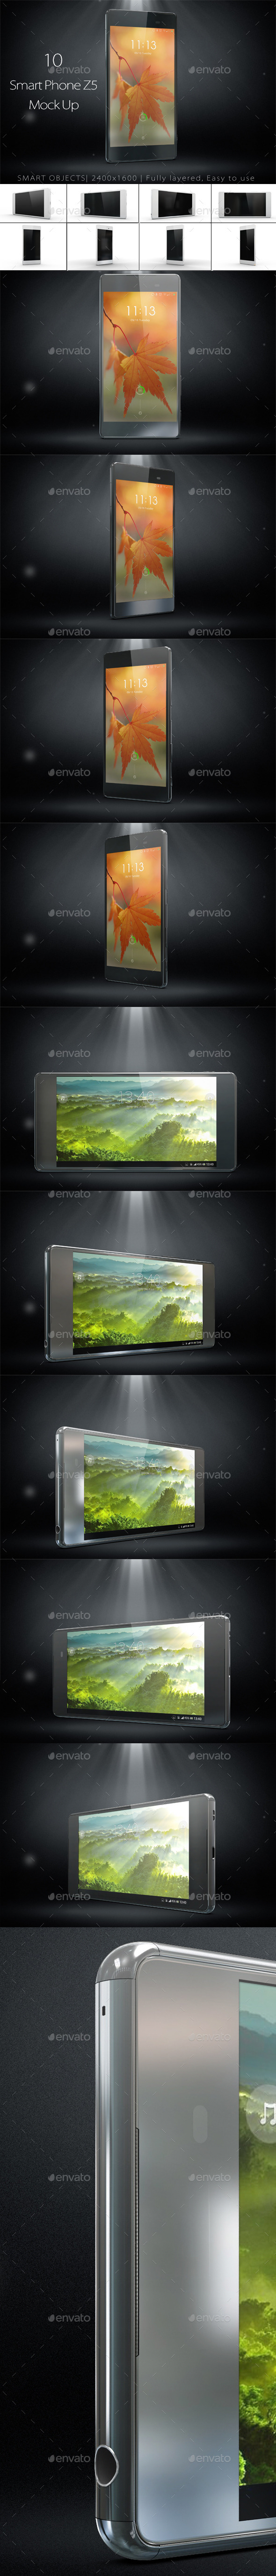 10 Phone Z5 Mock Up - Mobile Displays